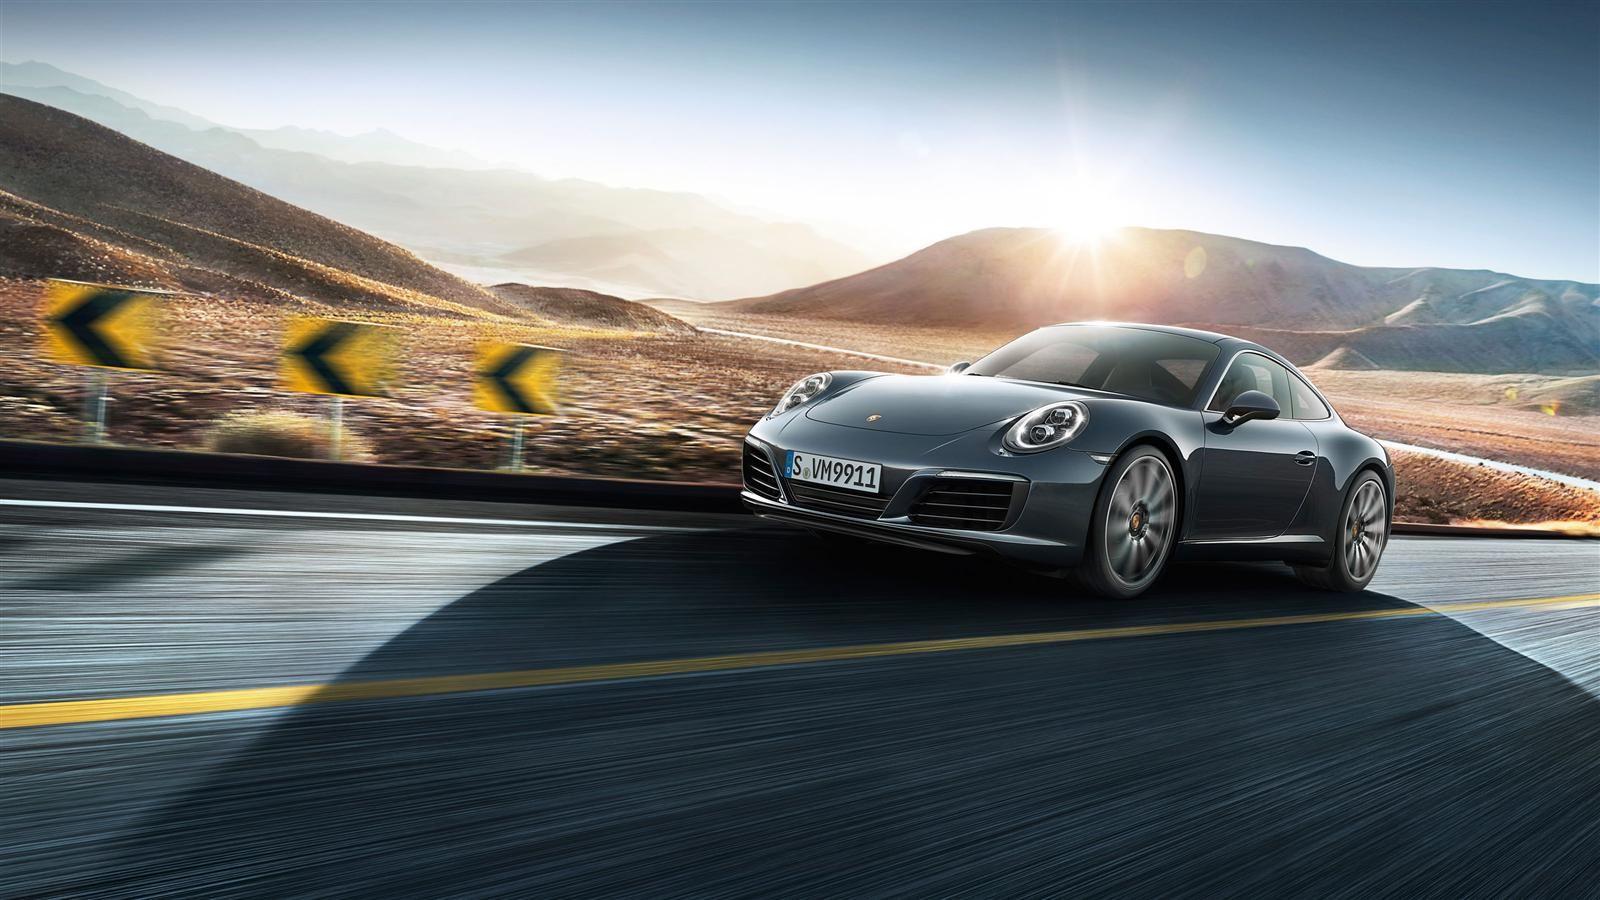 Nuevo Porsche911carrera Porsche 911 Porsche Porsche 911 Carrera